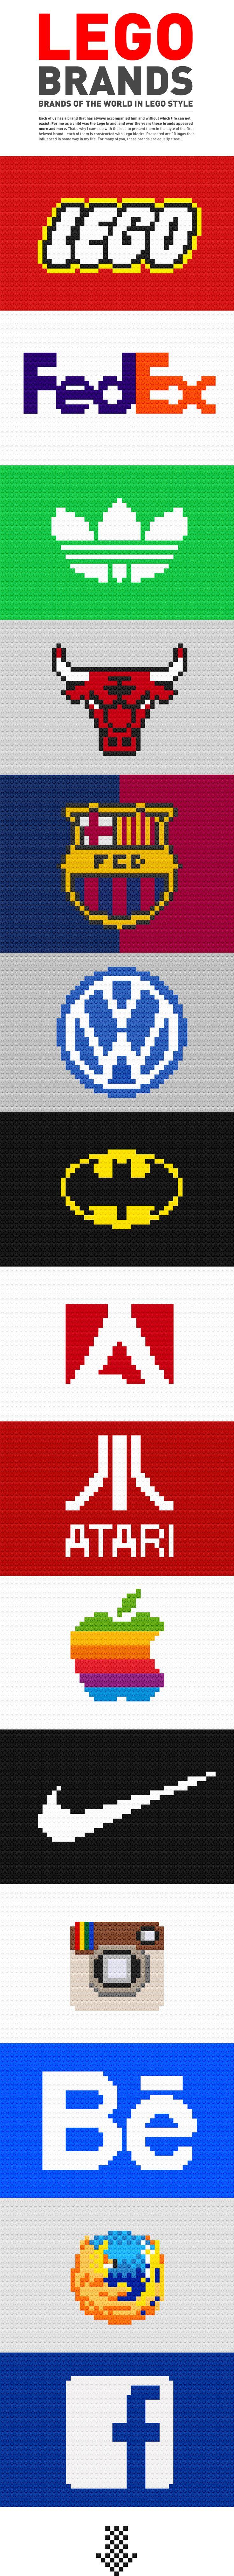 #lego #brand #identity #design #nike #adidas #facebook #chicago bulls #barcelona #atari #logo